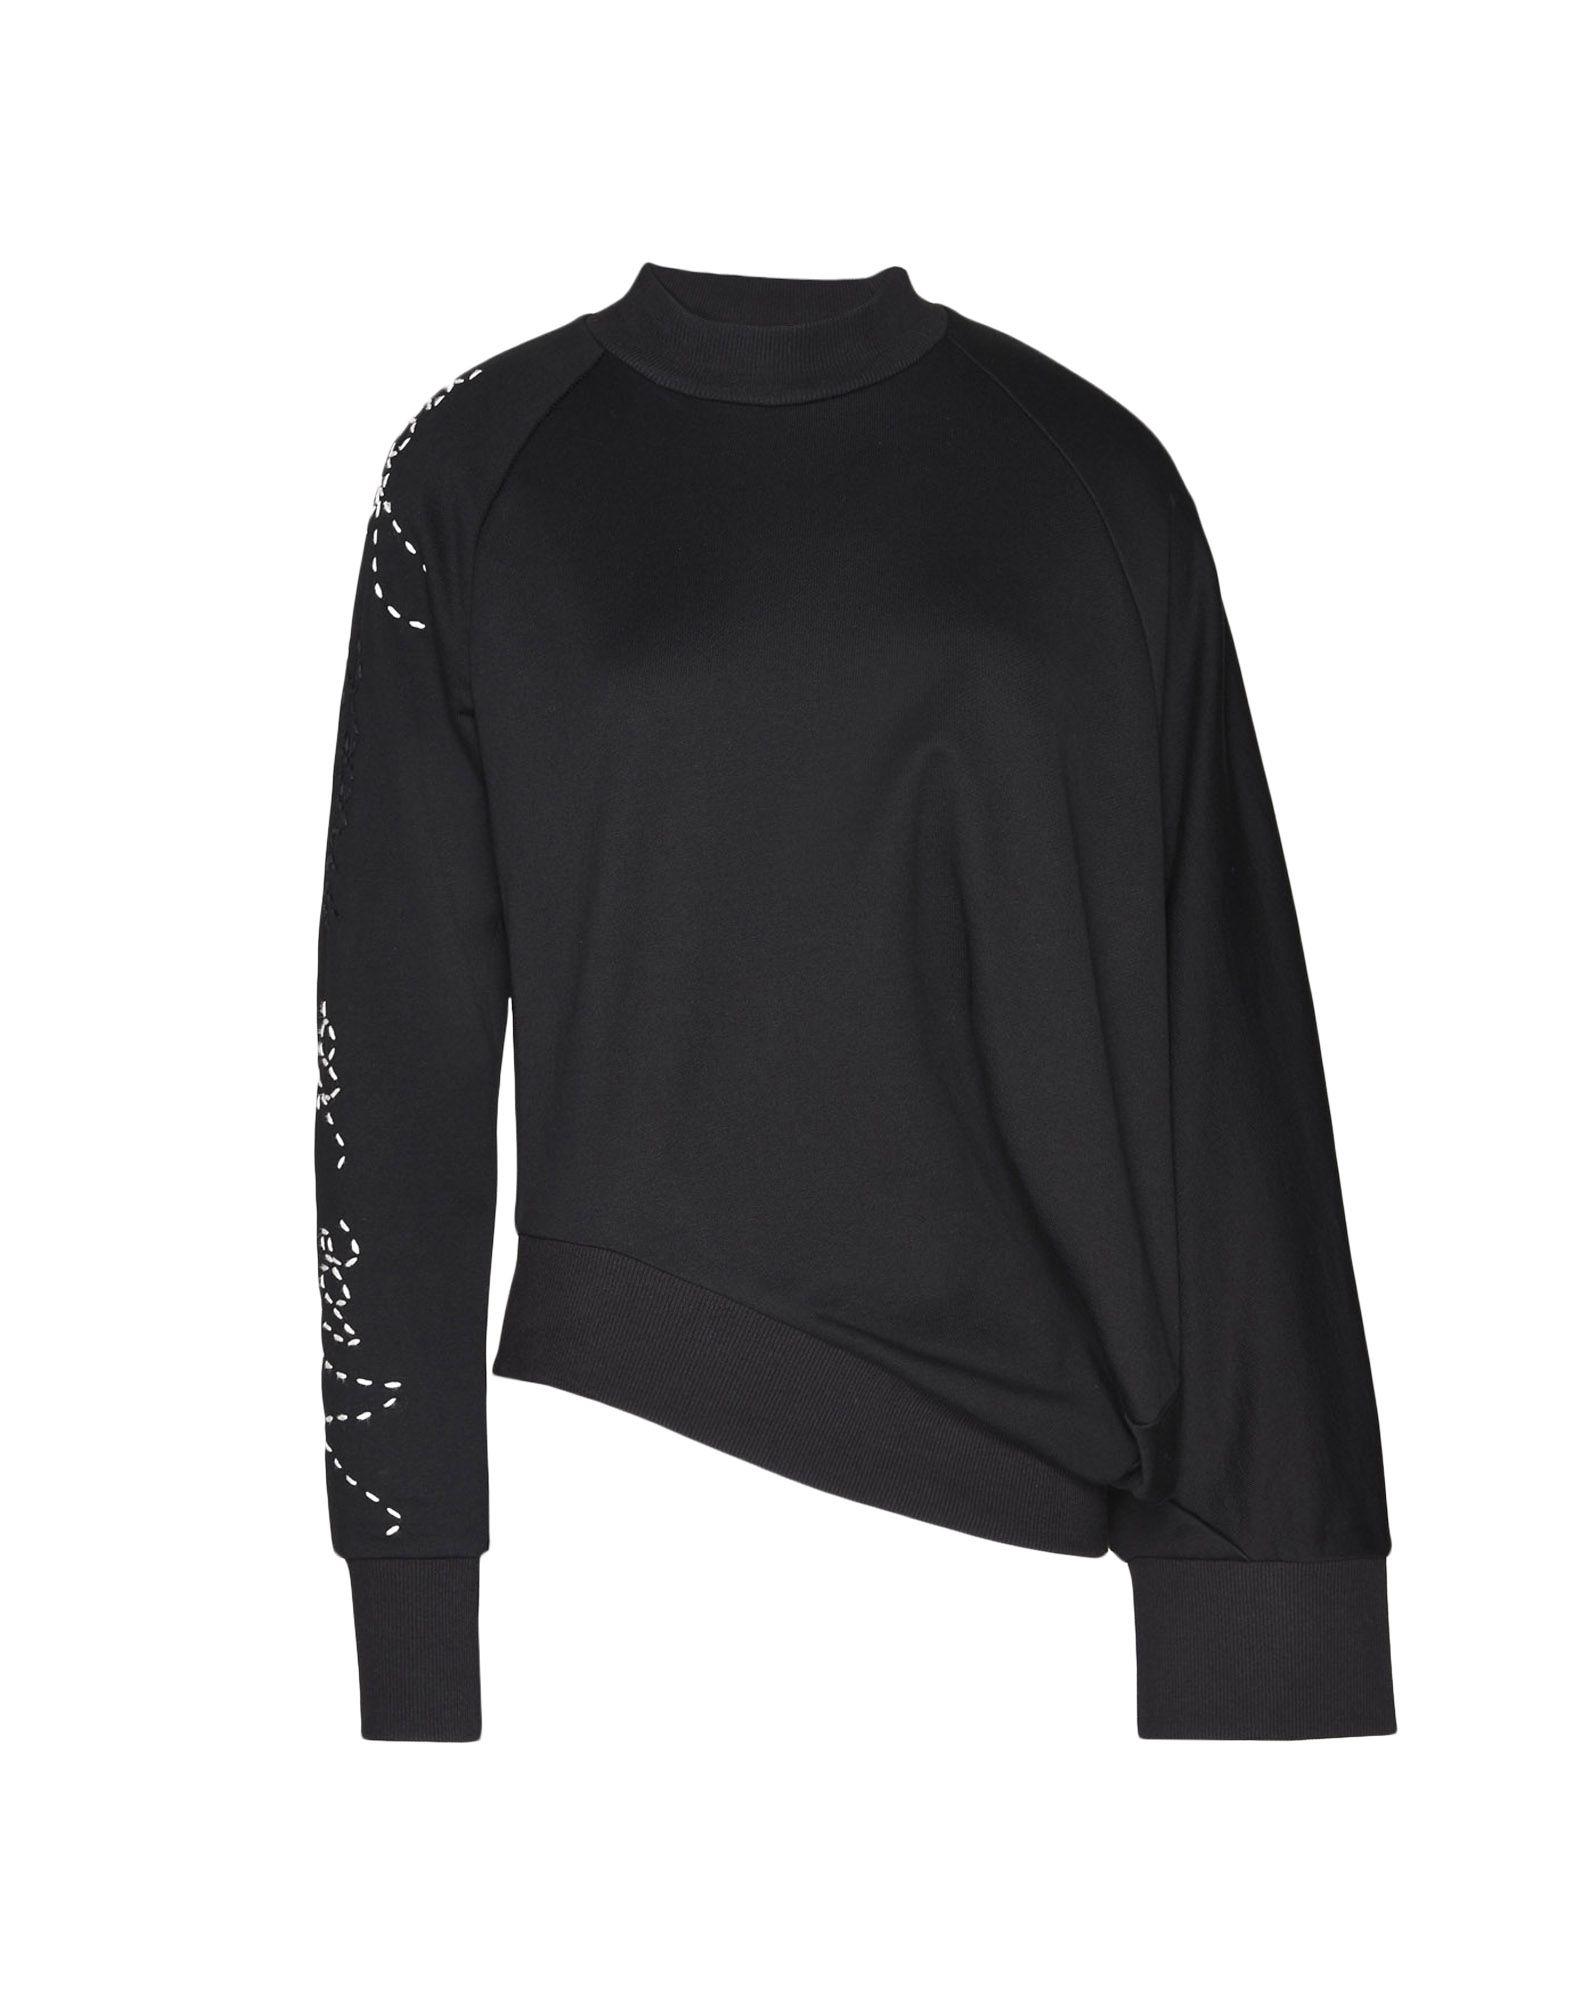 Sweater Adidas Slogan Sito Y Felpe Nero Sashiko 3 vBqxWtwR8